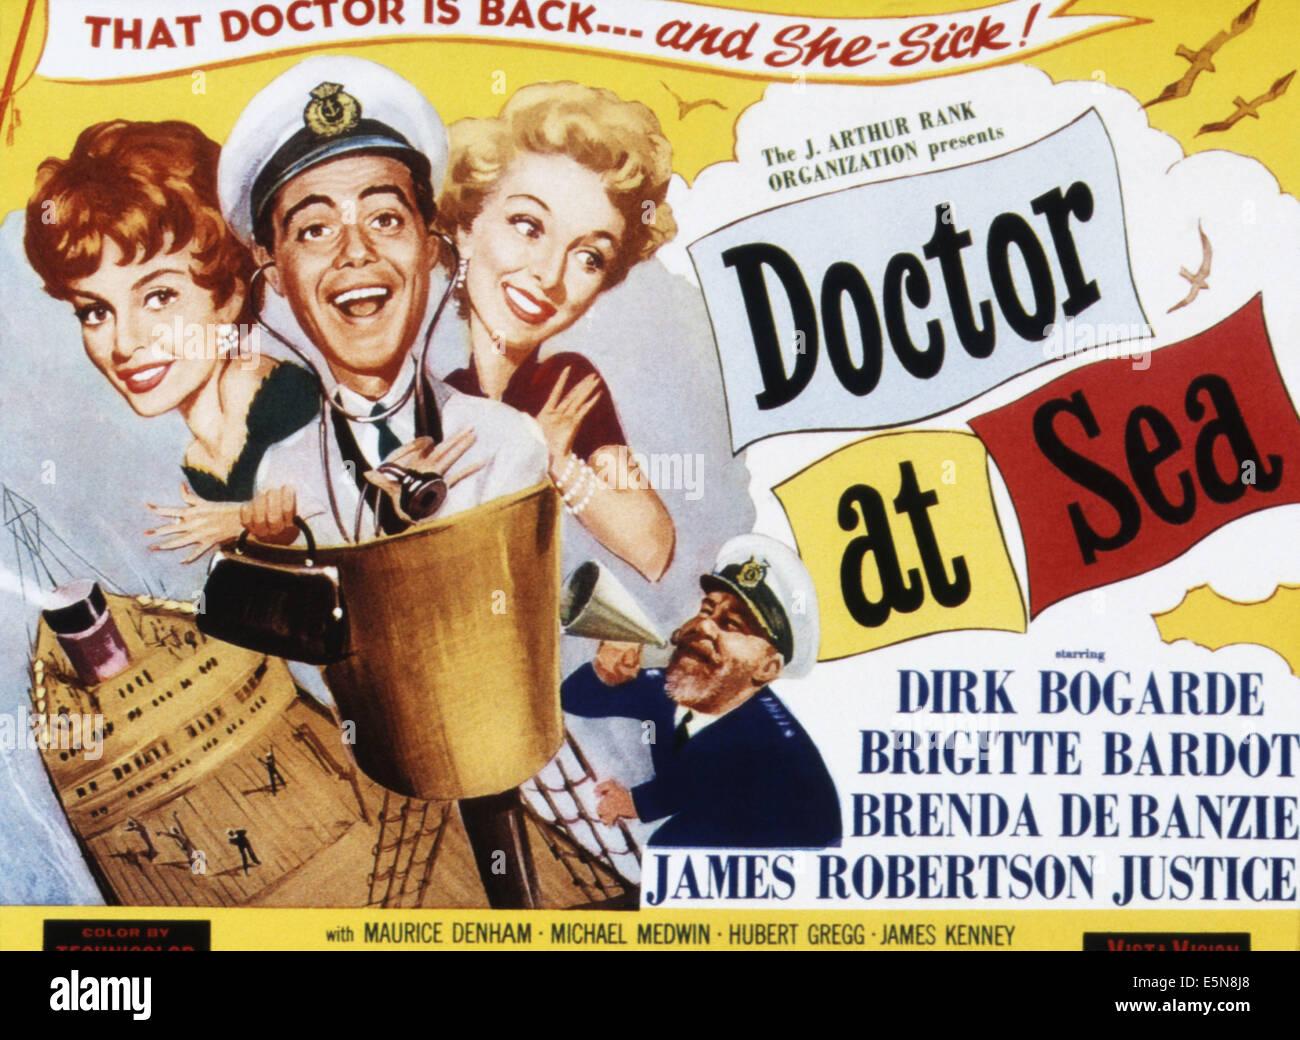 DOCTOR AT SEA, from left: Brigitte Bardot, dirk Bogarde, Brenda De Banzie, James Robertson Justice, 1955 - Stock Image